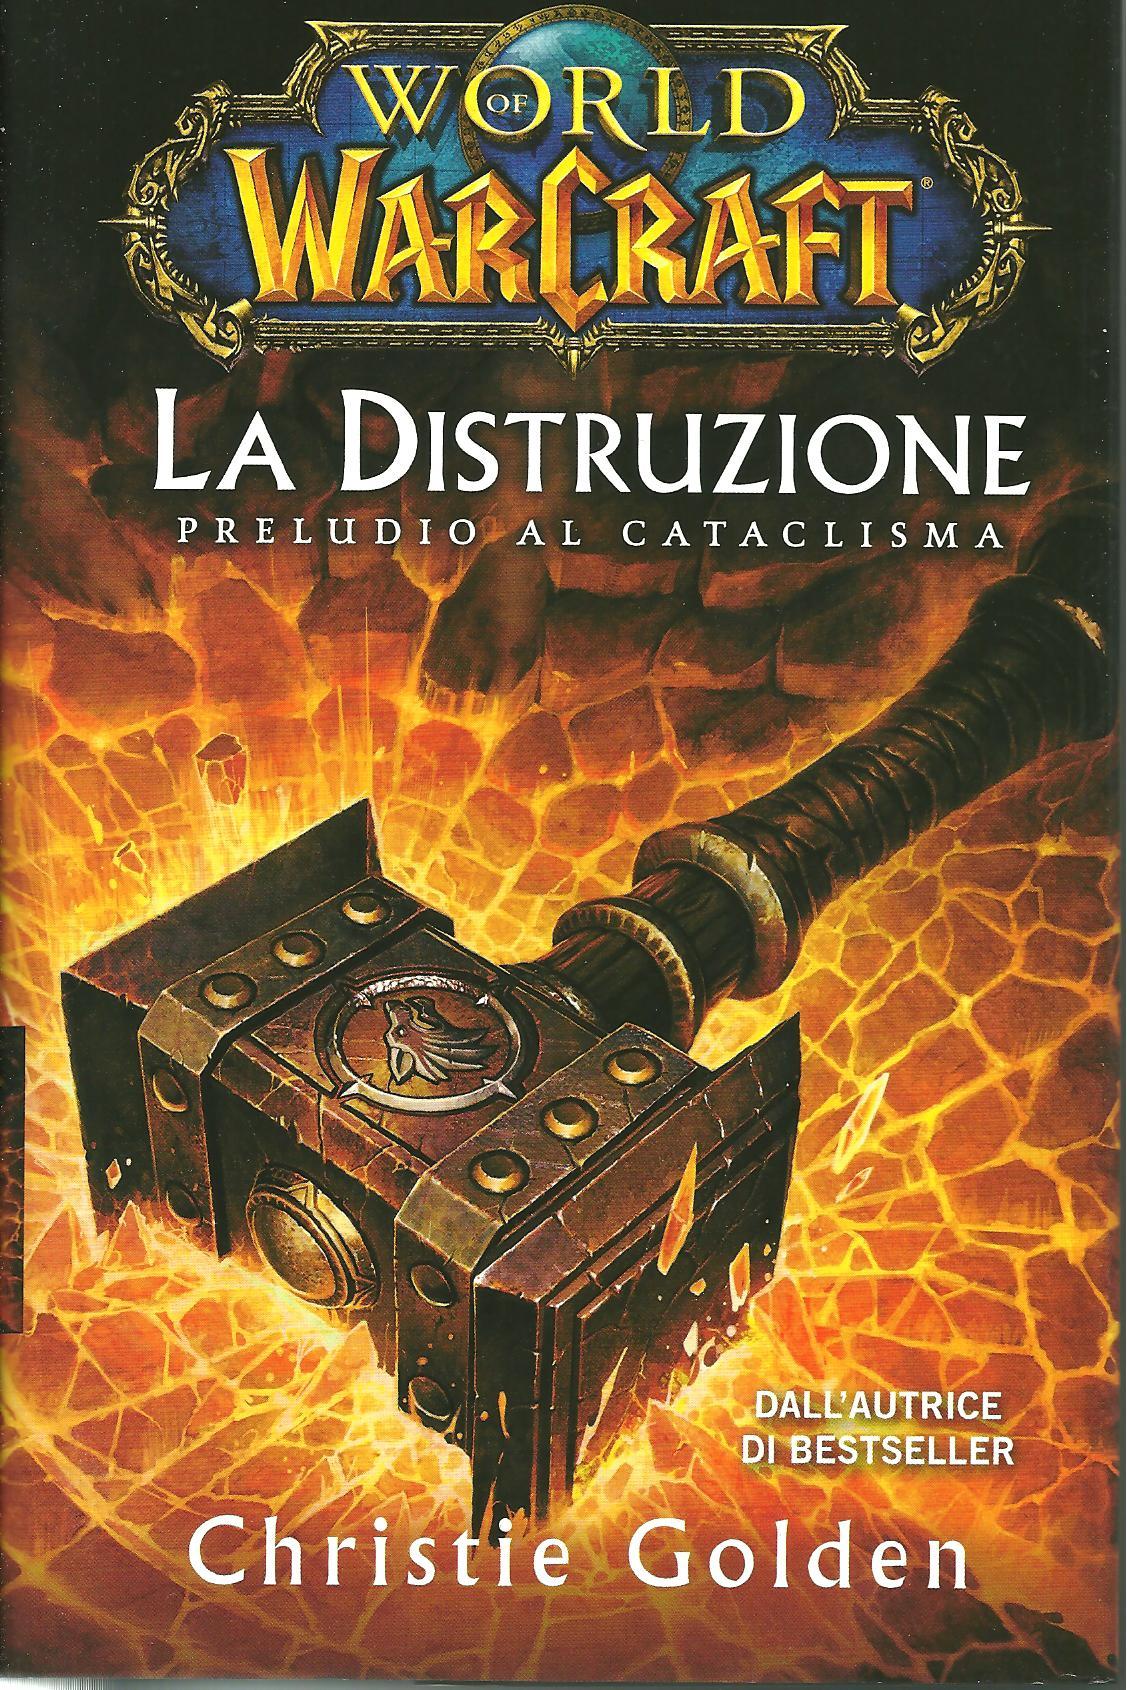 World of Warcraft - la distruzione